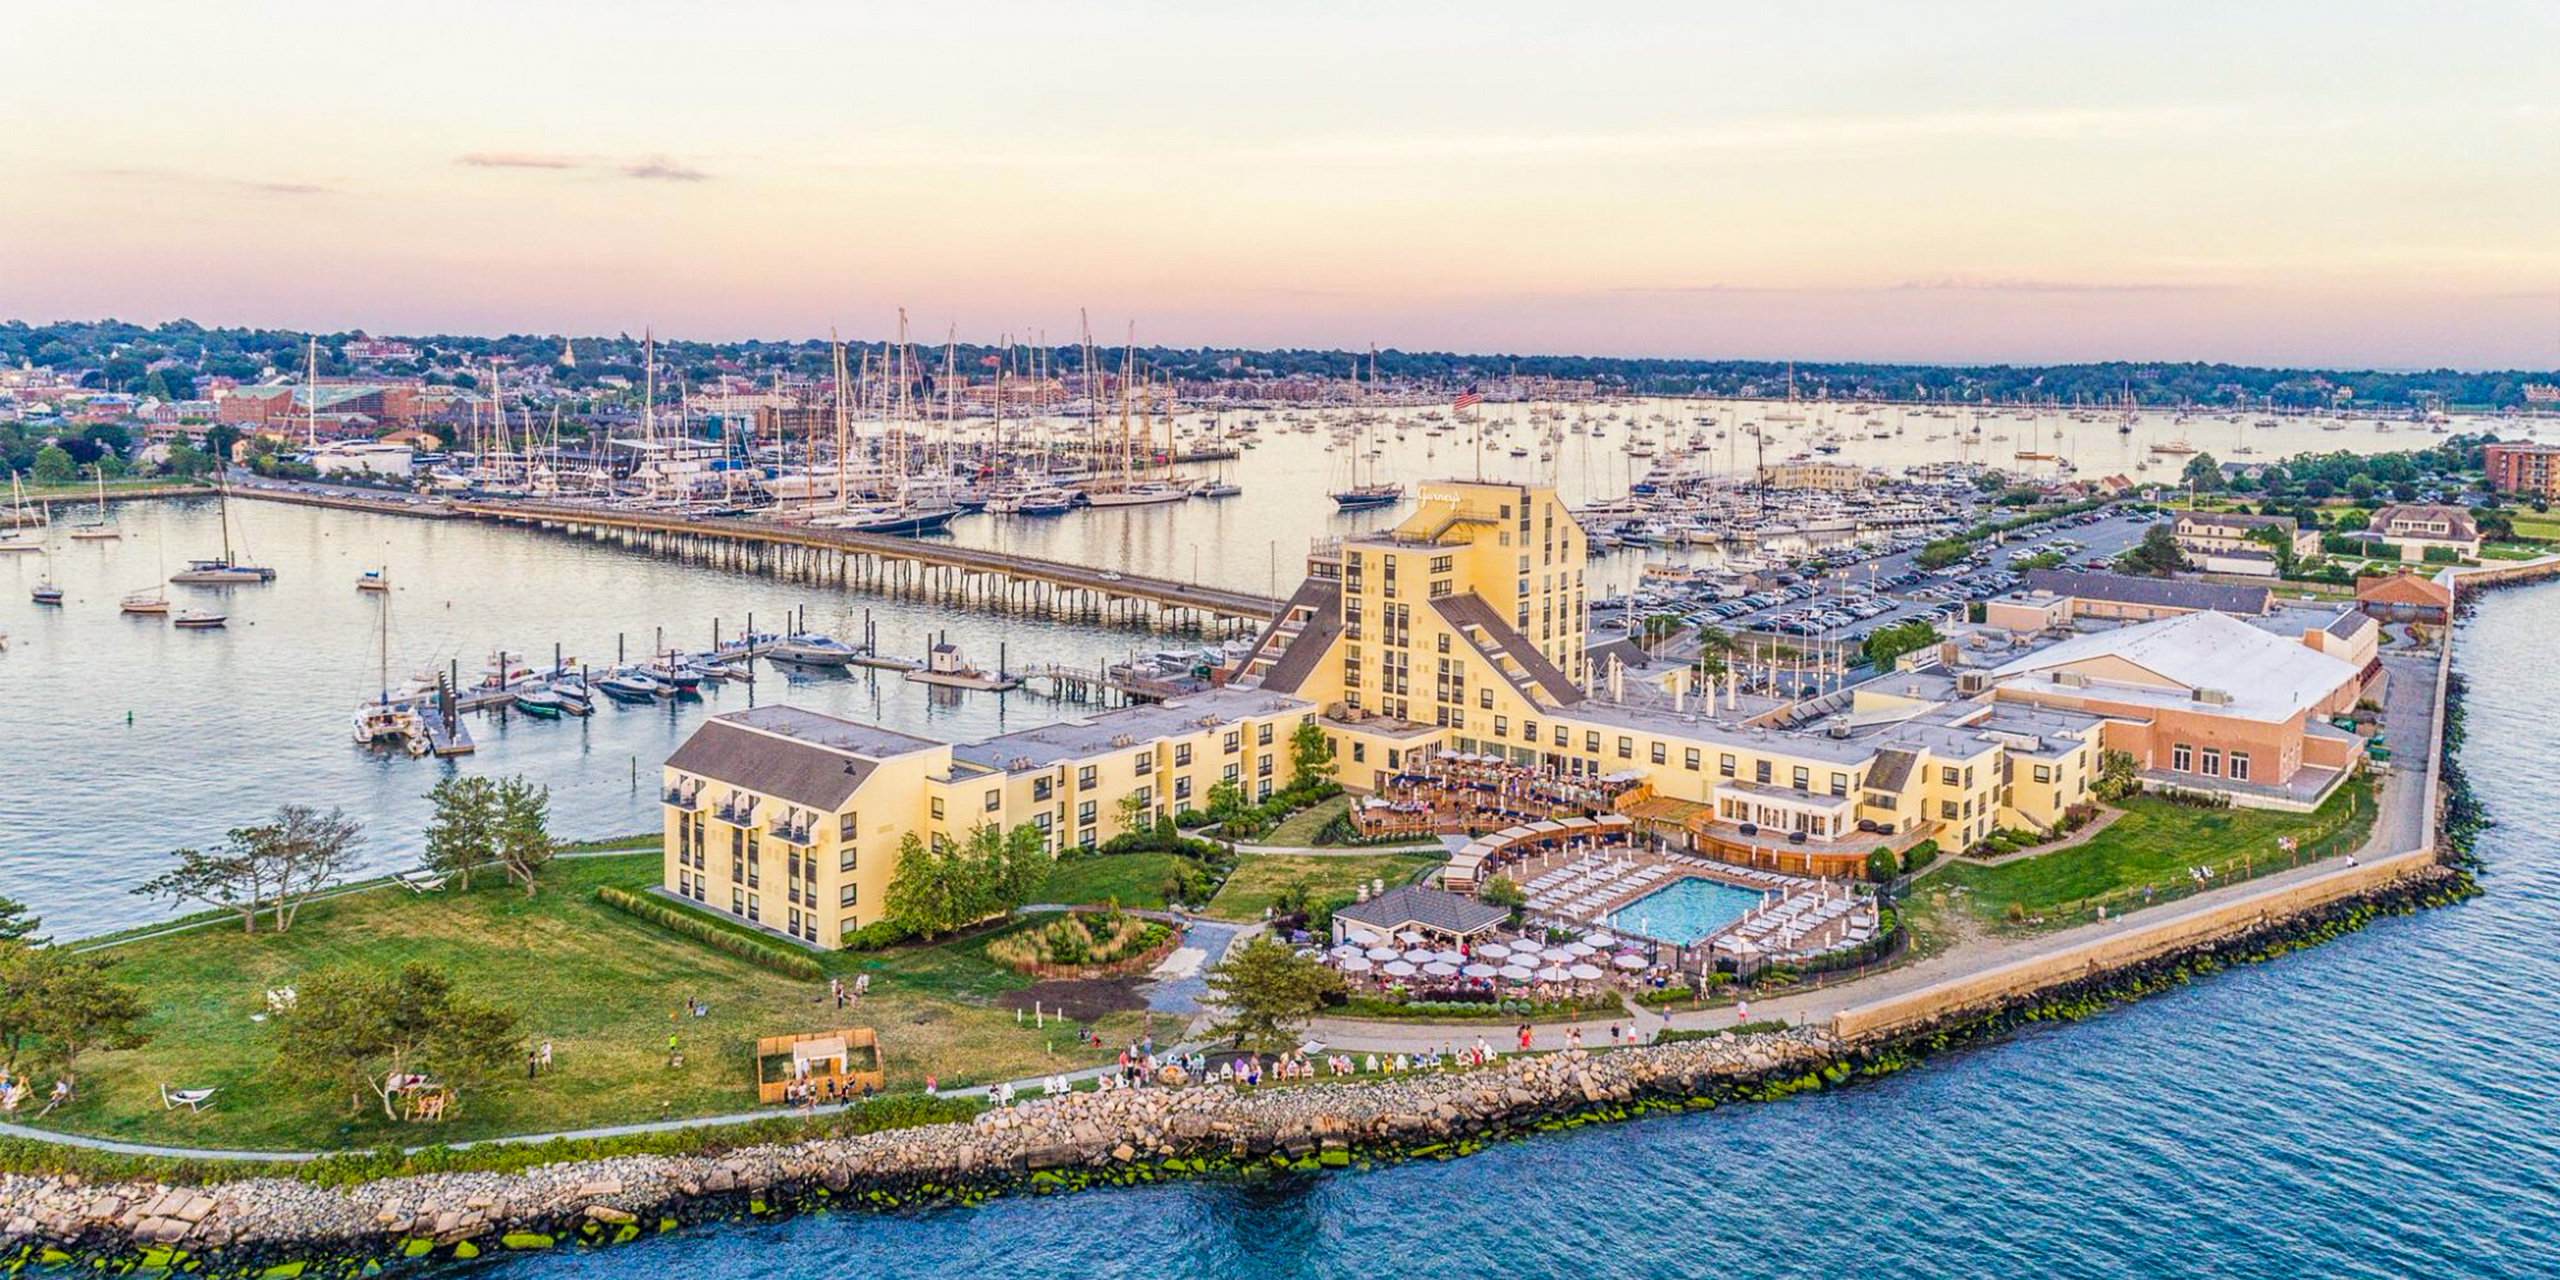 Gurney's Newport Resort & Marina; Courtesy of Gurney's Newport Resort & Marina